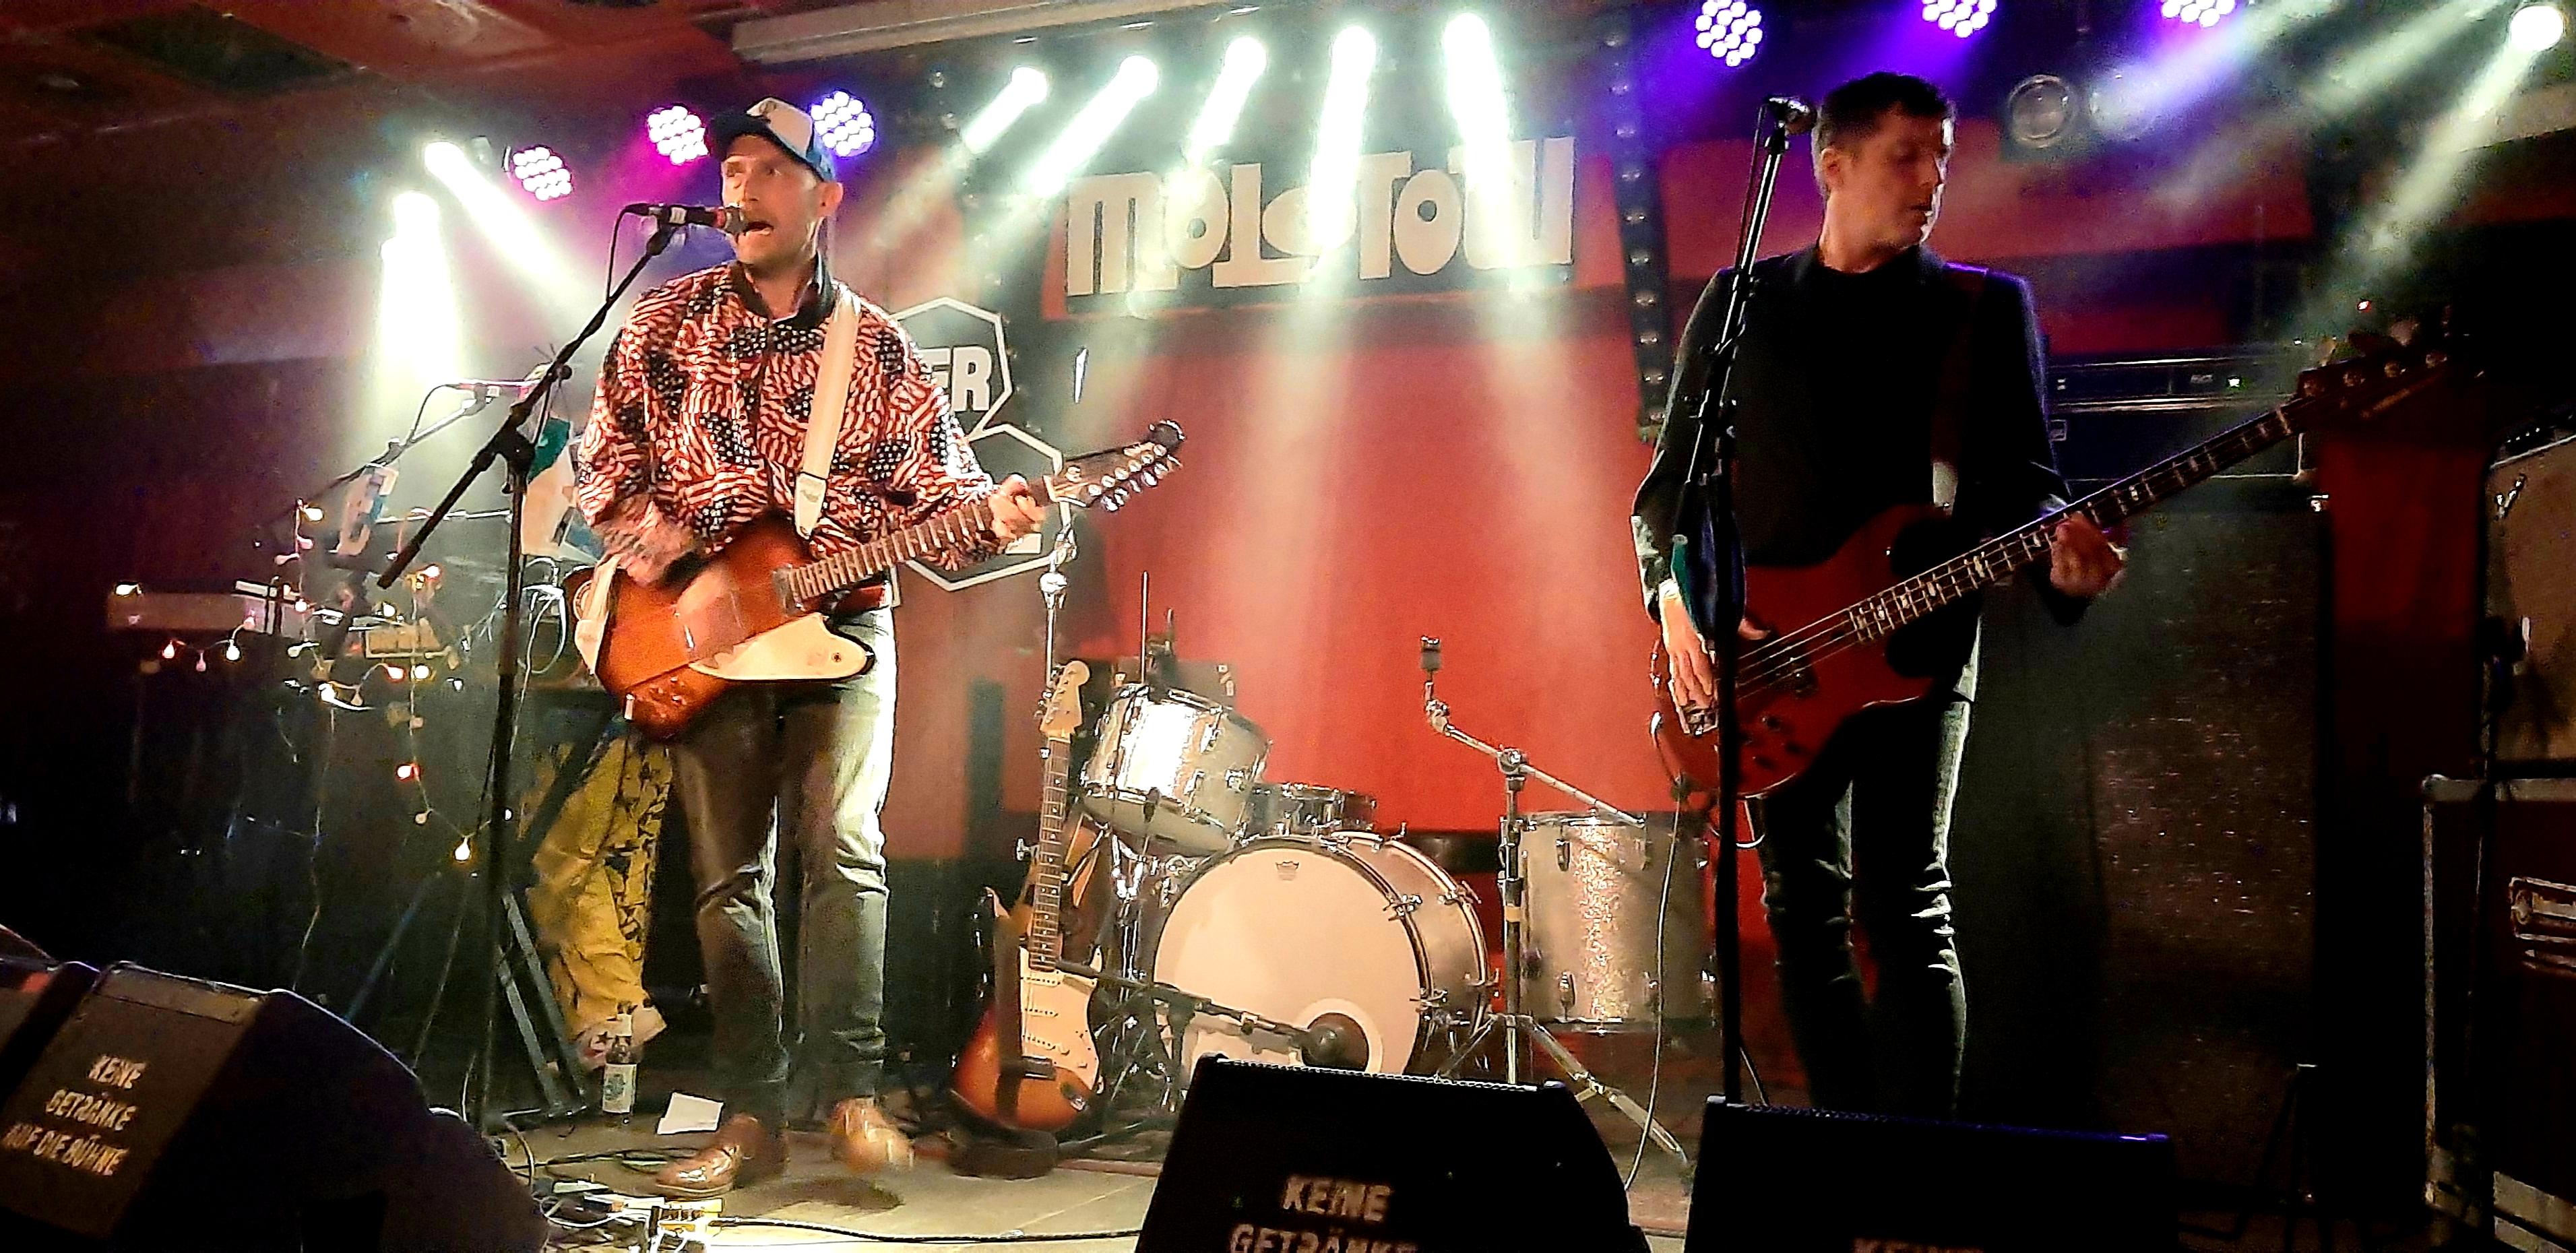 Die Realität, Band, Köln, Molotow, bestuhlt, Reeperbahn Festival, Hamburg, St. Pauli, Tag 4, Fazit